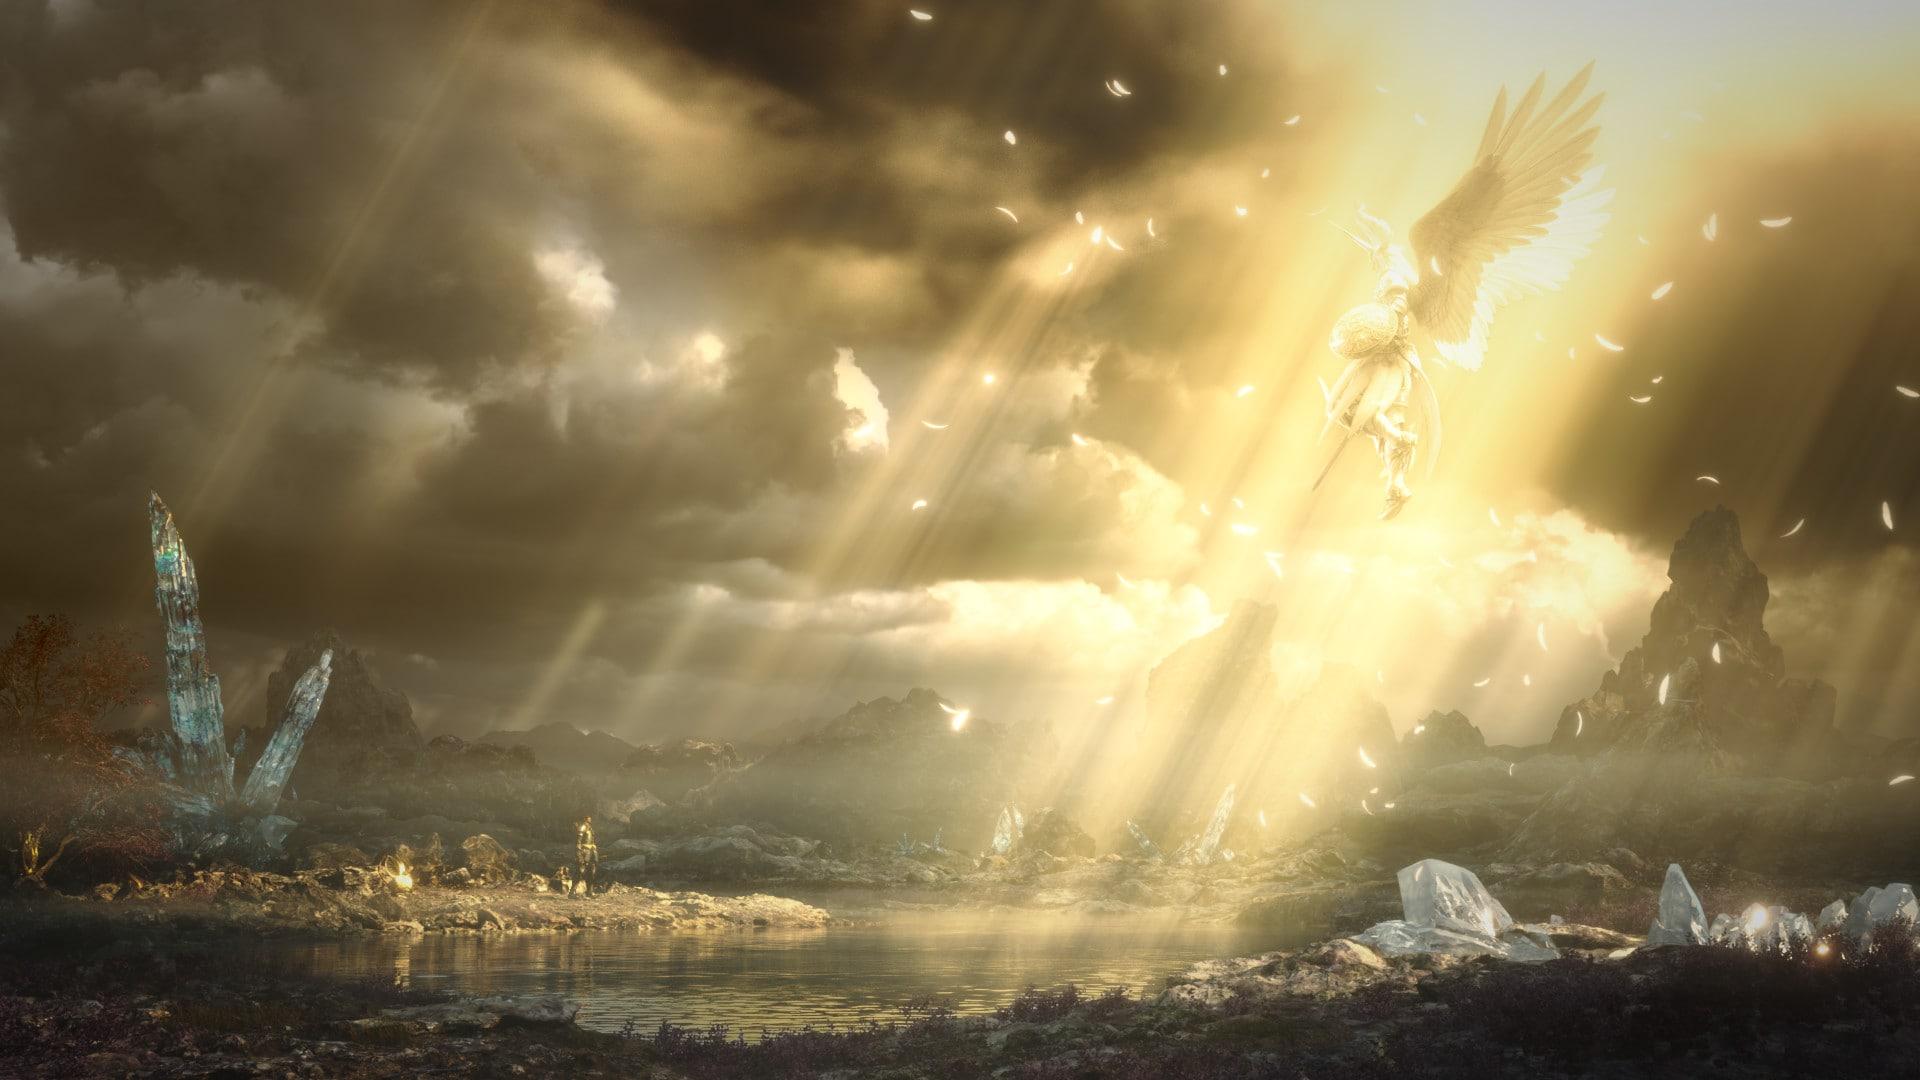 FINAL FANTASY XIV: Shadowbringers (PC) - Final Fantasy Key - NORTH AMERICA - 3